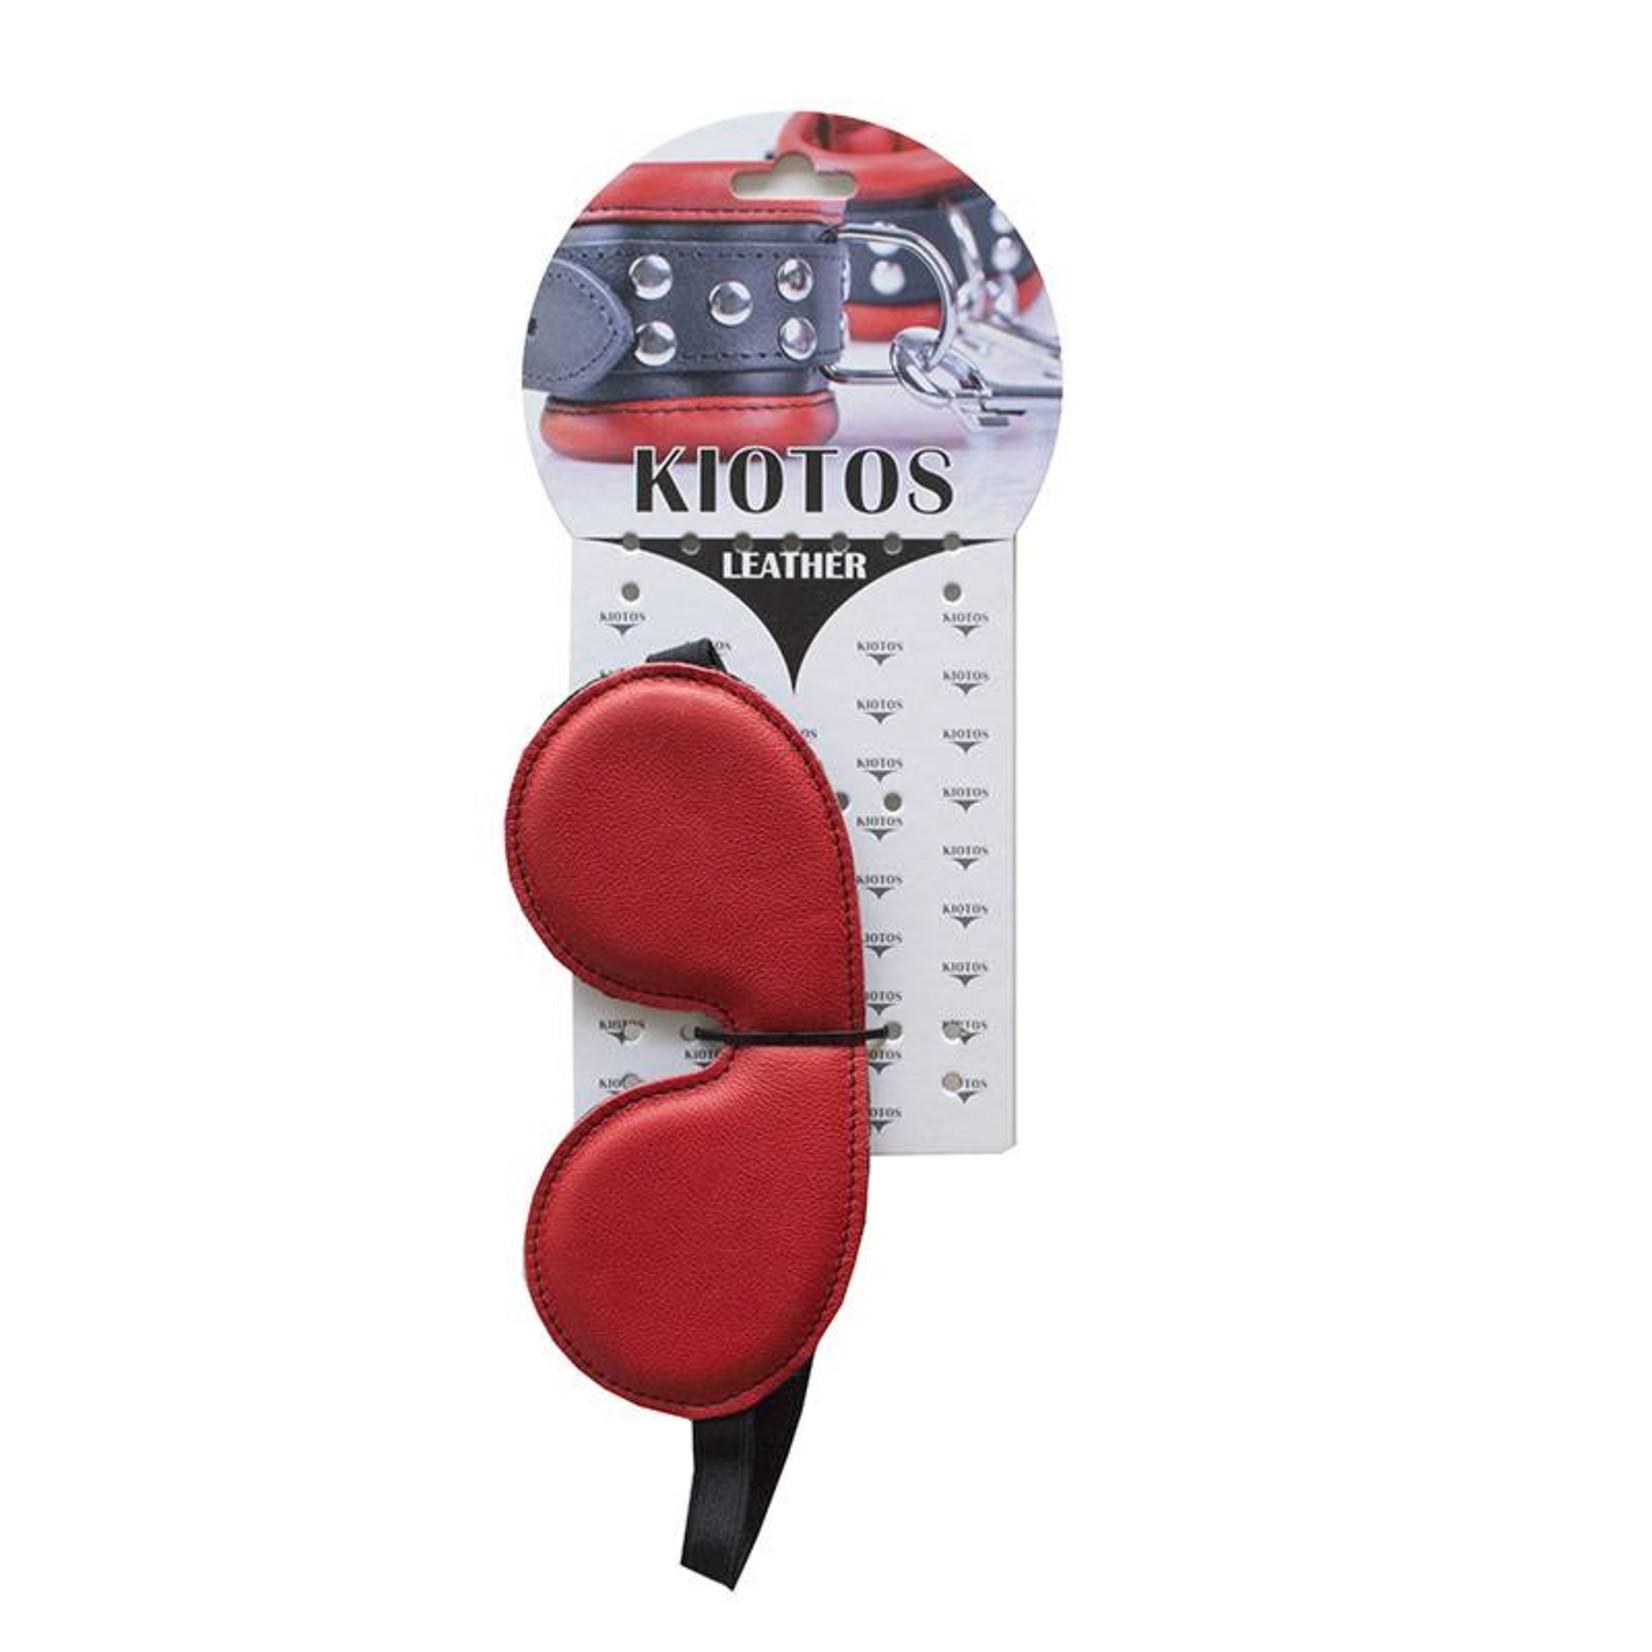 KIOTOS Leather Eyemask Leather - Red